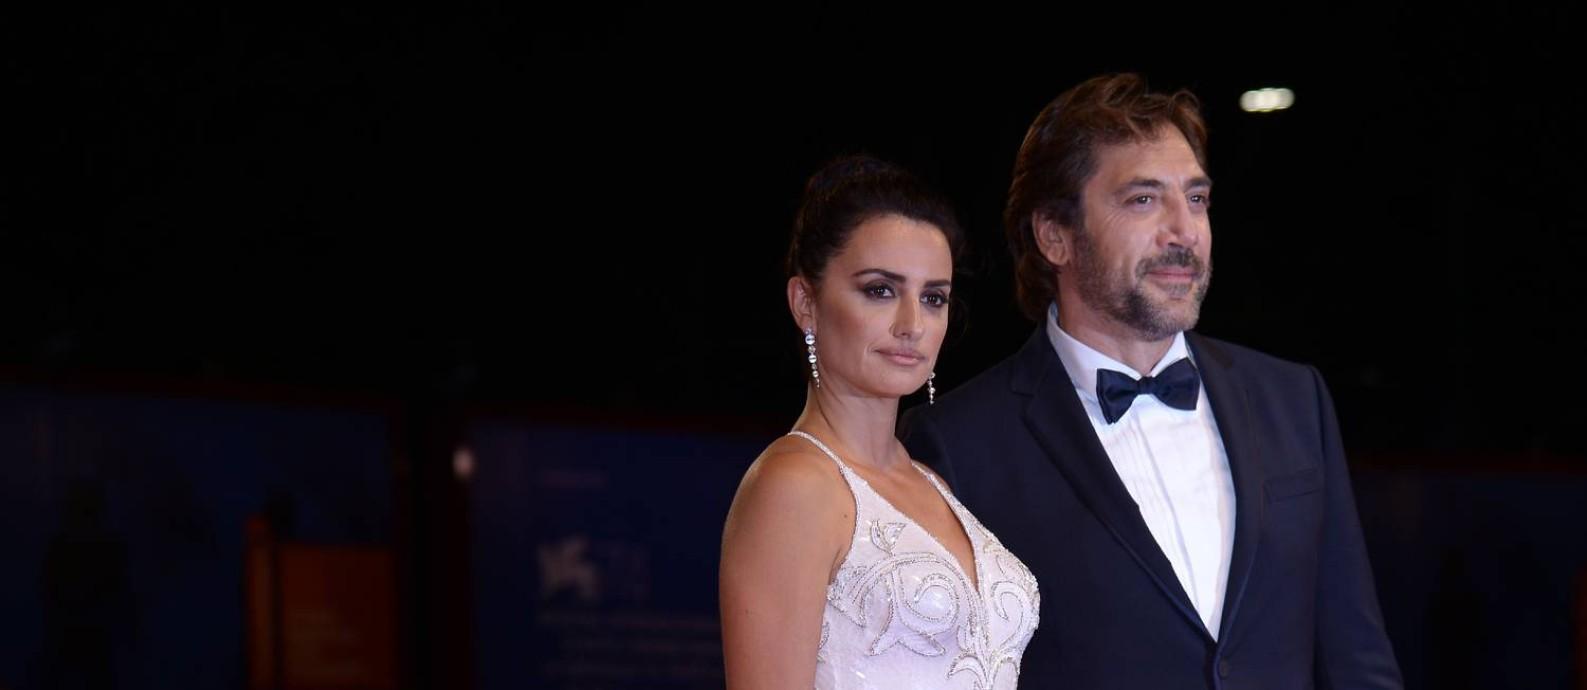 Penelope Cruz e Javier Bardem na premiére de 'Amando Pablo', no Festival de Veneza de 2017 Foto: Filippo Monteforte / AFP